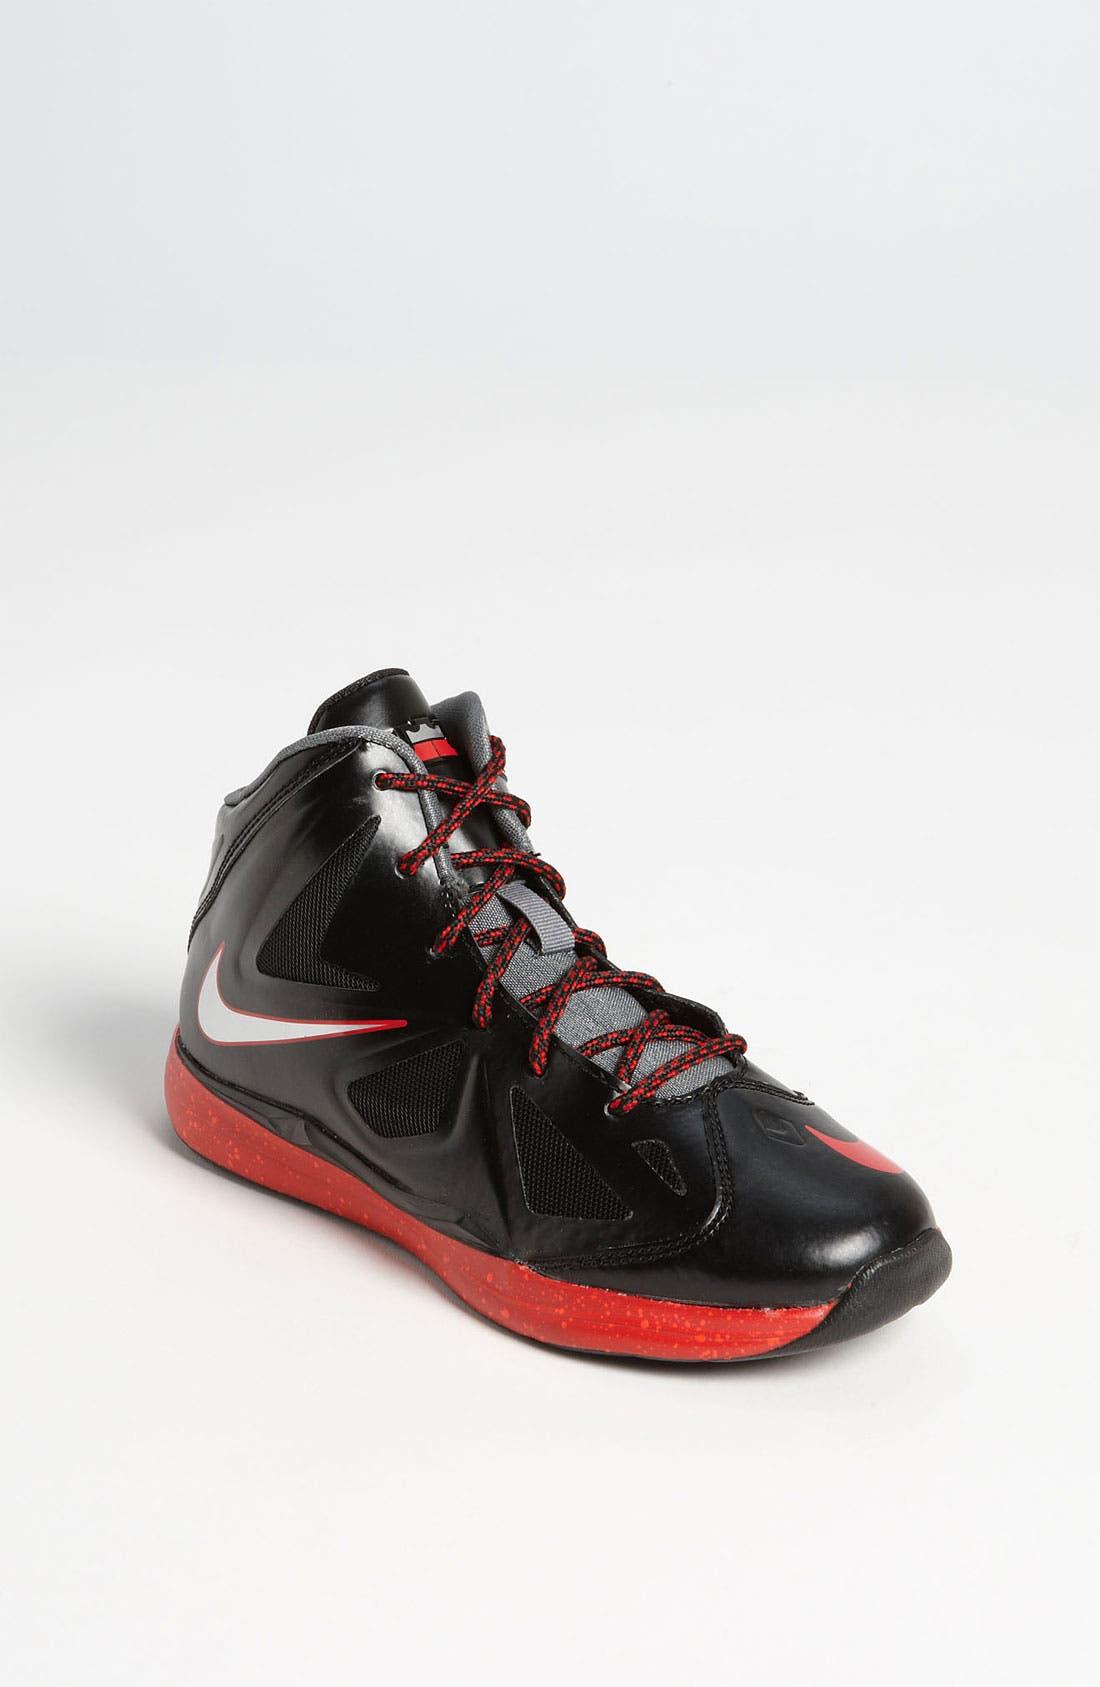 Alternate Image 1 Selected - Nike 'LeBron 10 Pressure' Basketball Shoe (Toddler & Little Kid)